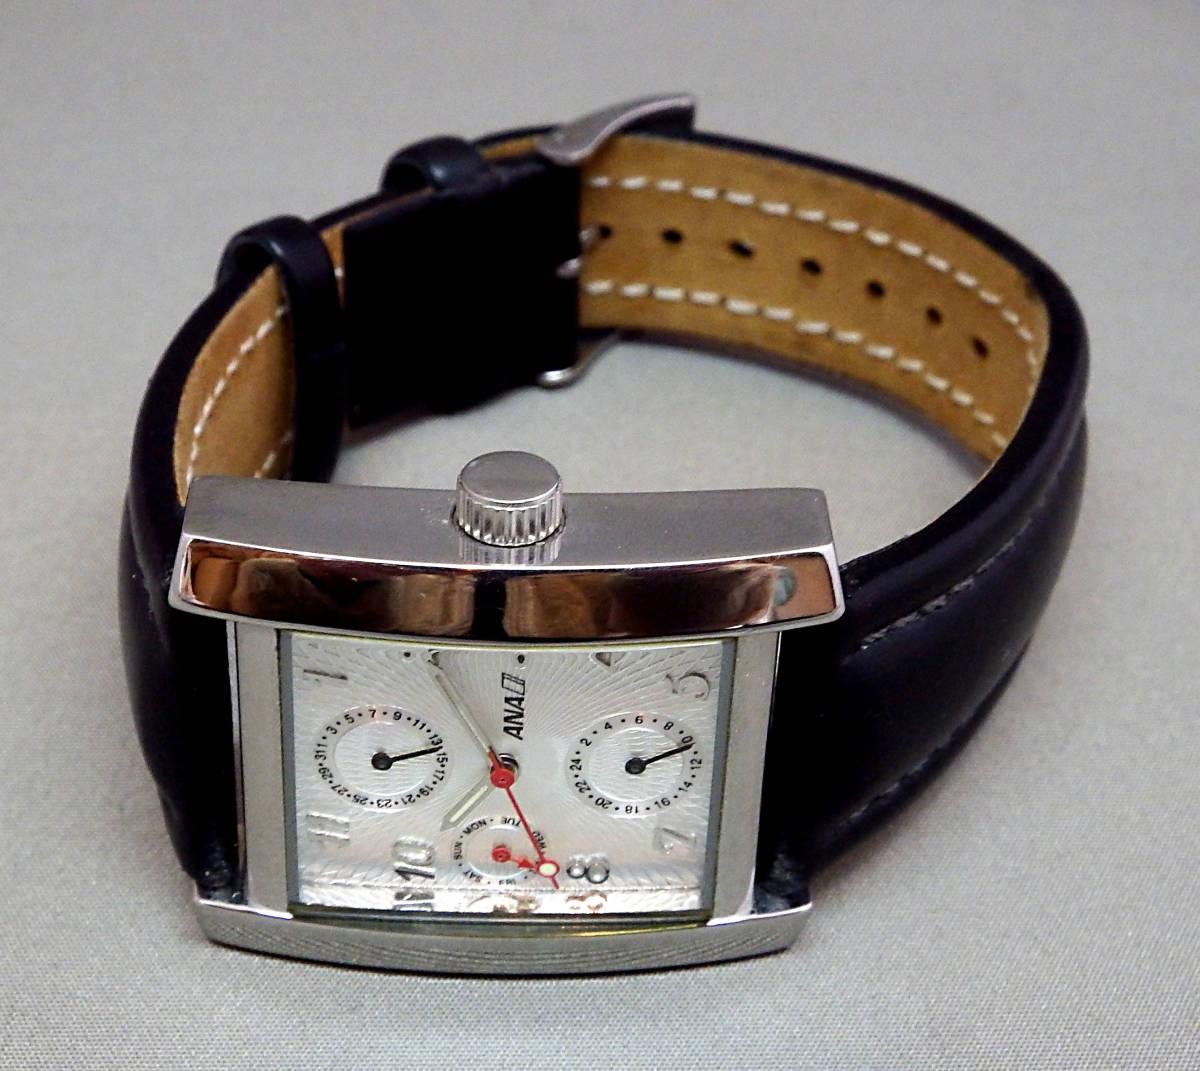 EU-9674■ANA メンズ腕時計 3針カレンダ- 角型 革バンド 中古_画像2